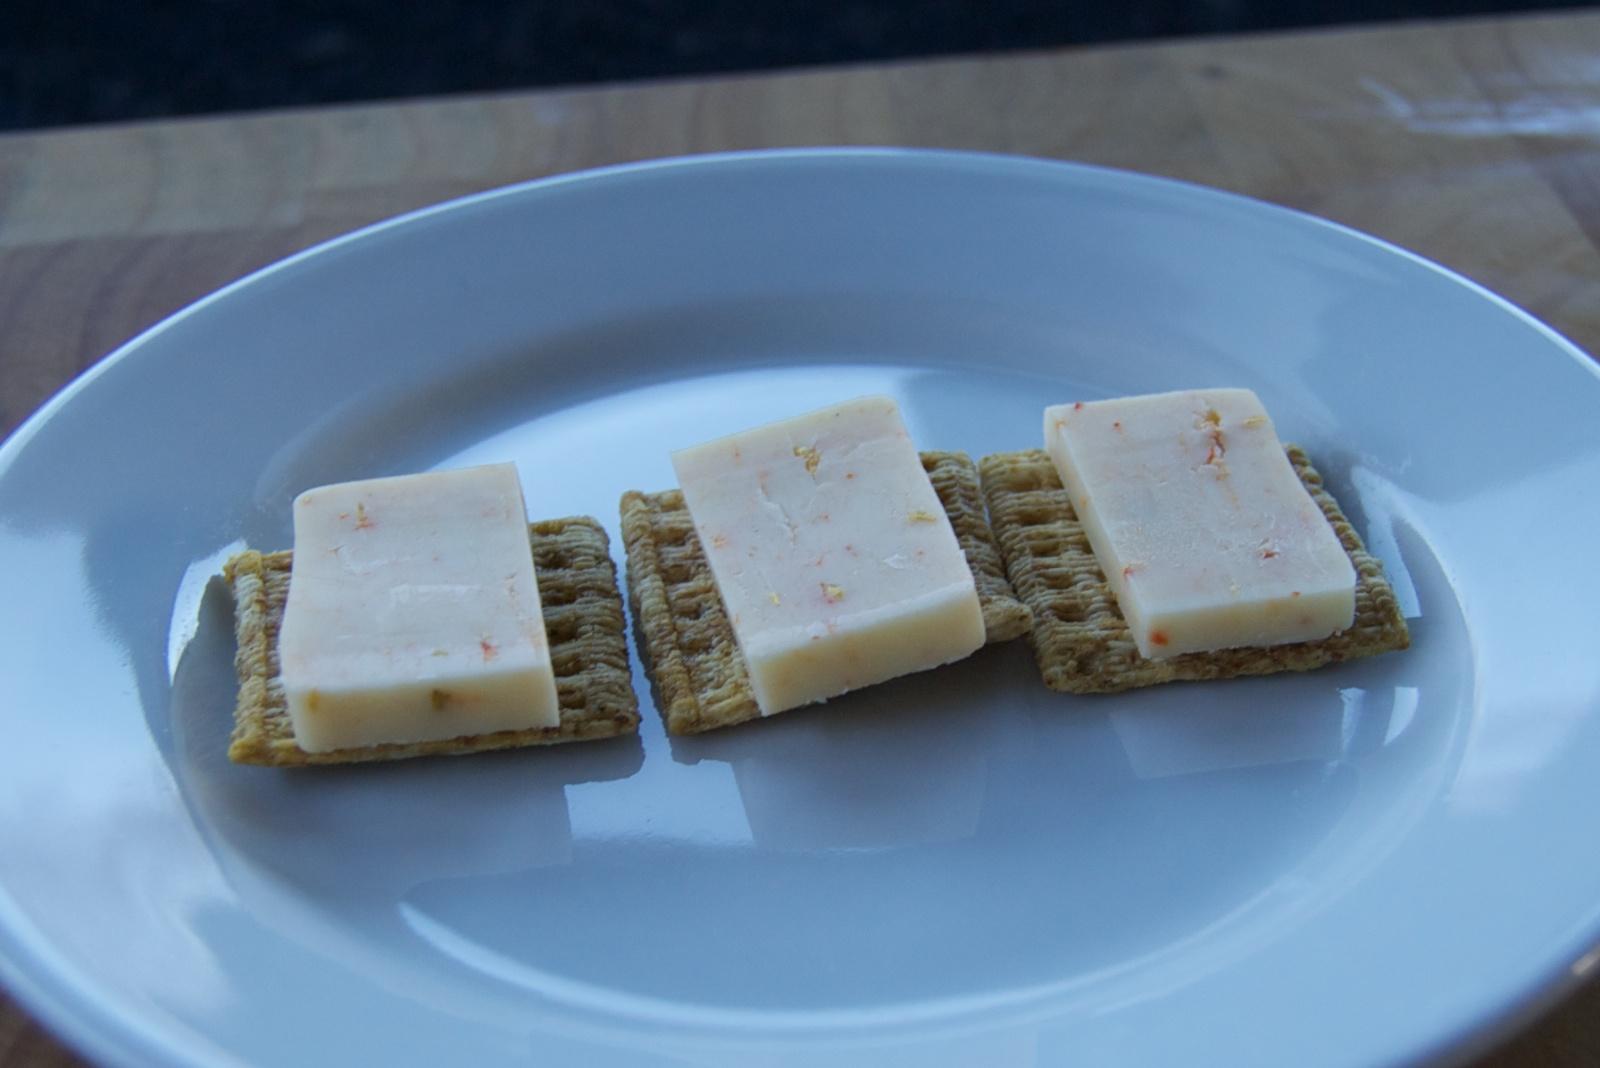 http://blog.rickk.com/food/2011/12/14/ate.2011.12.14.s1.jpg